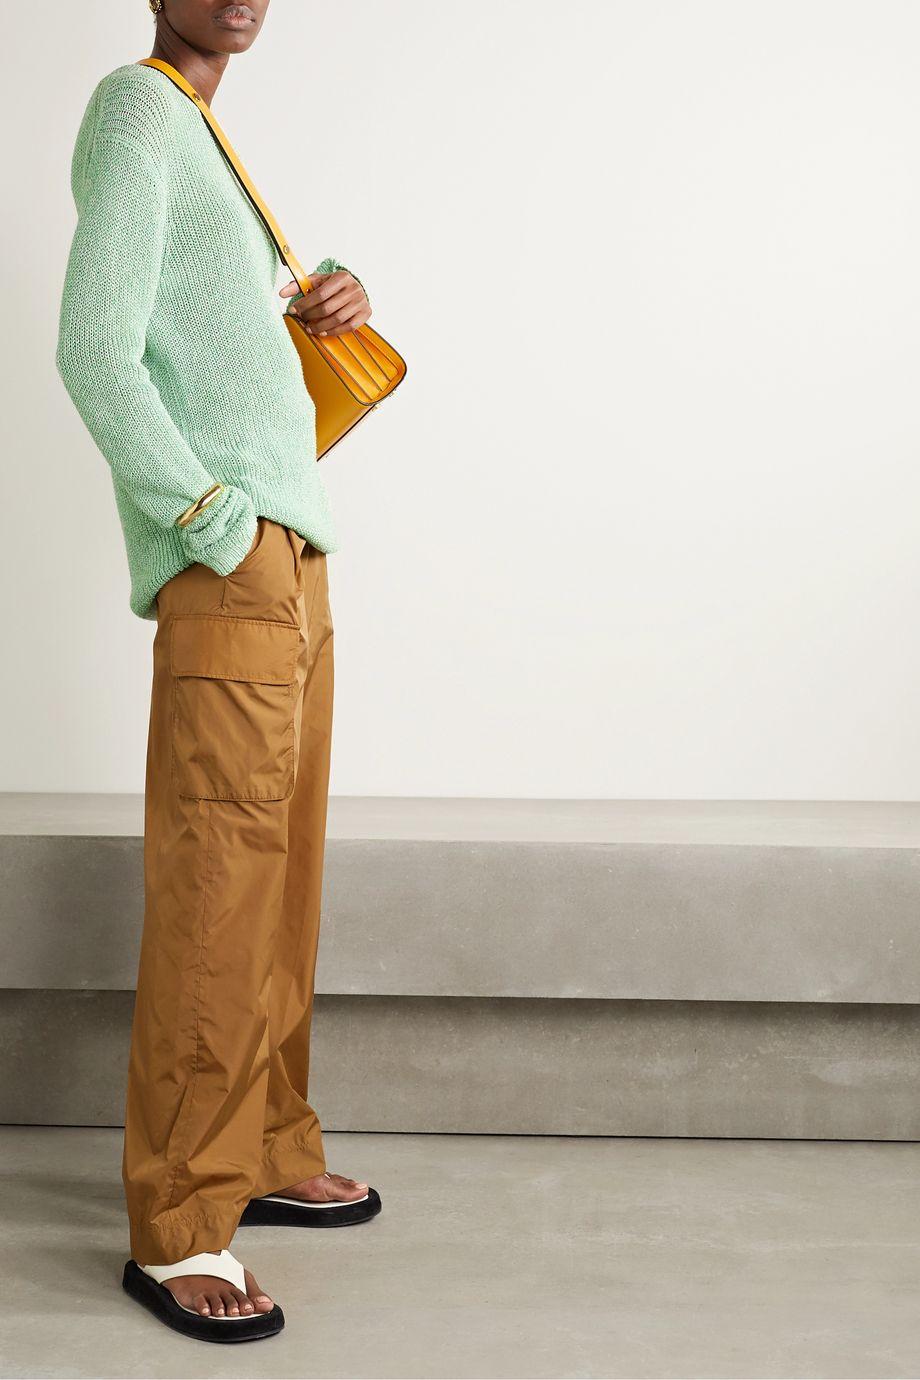 Tibi Crispy cotton sweater